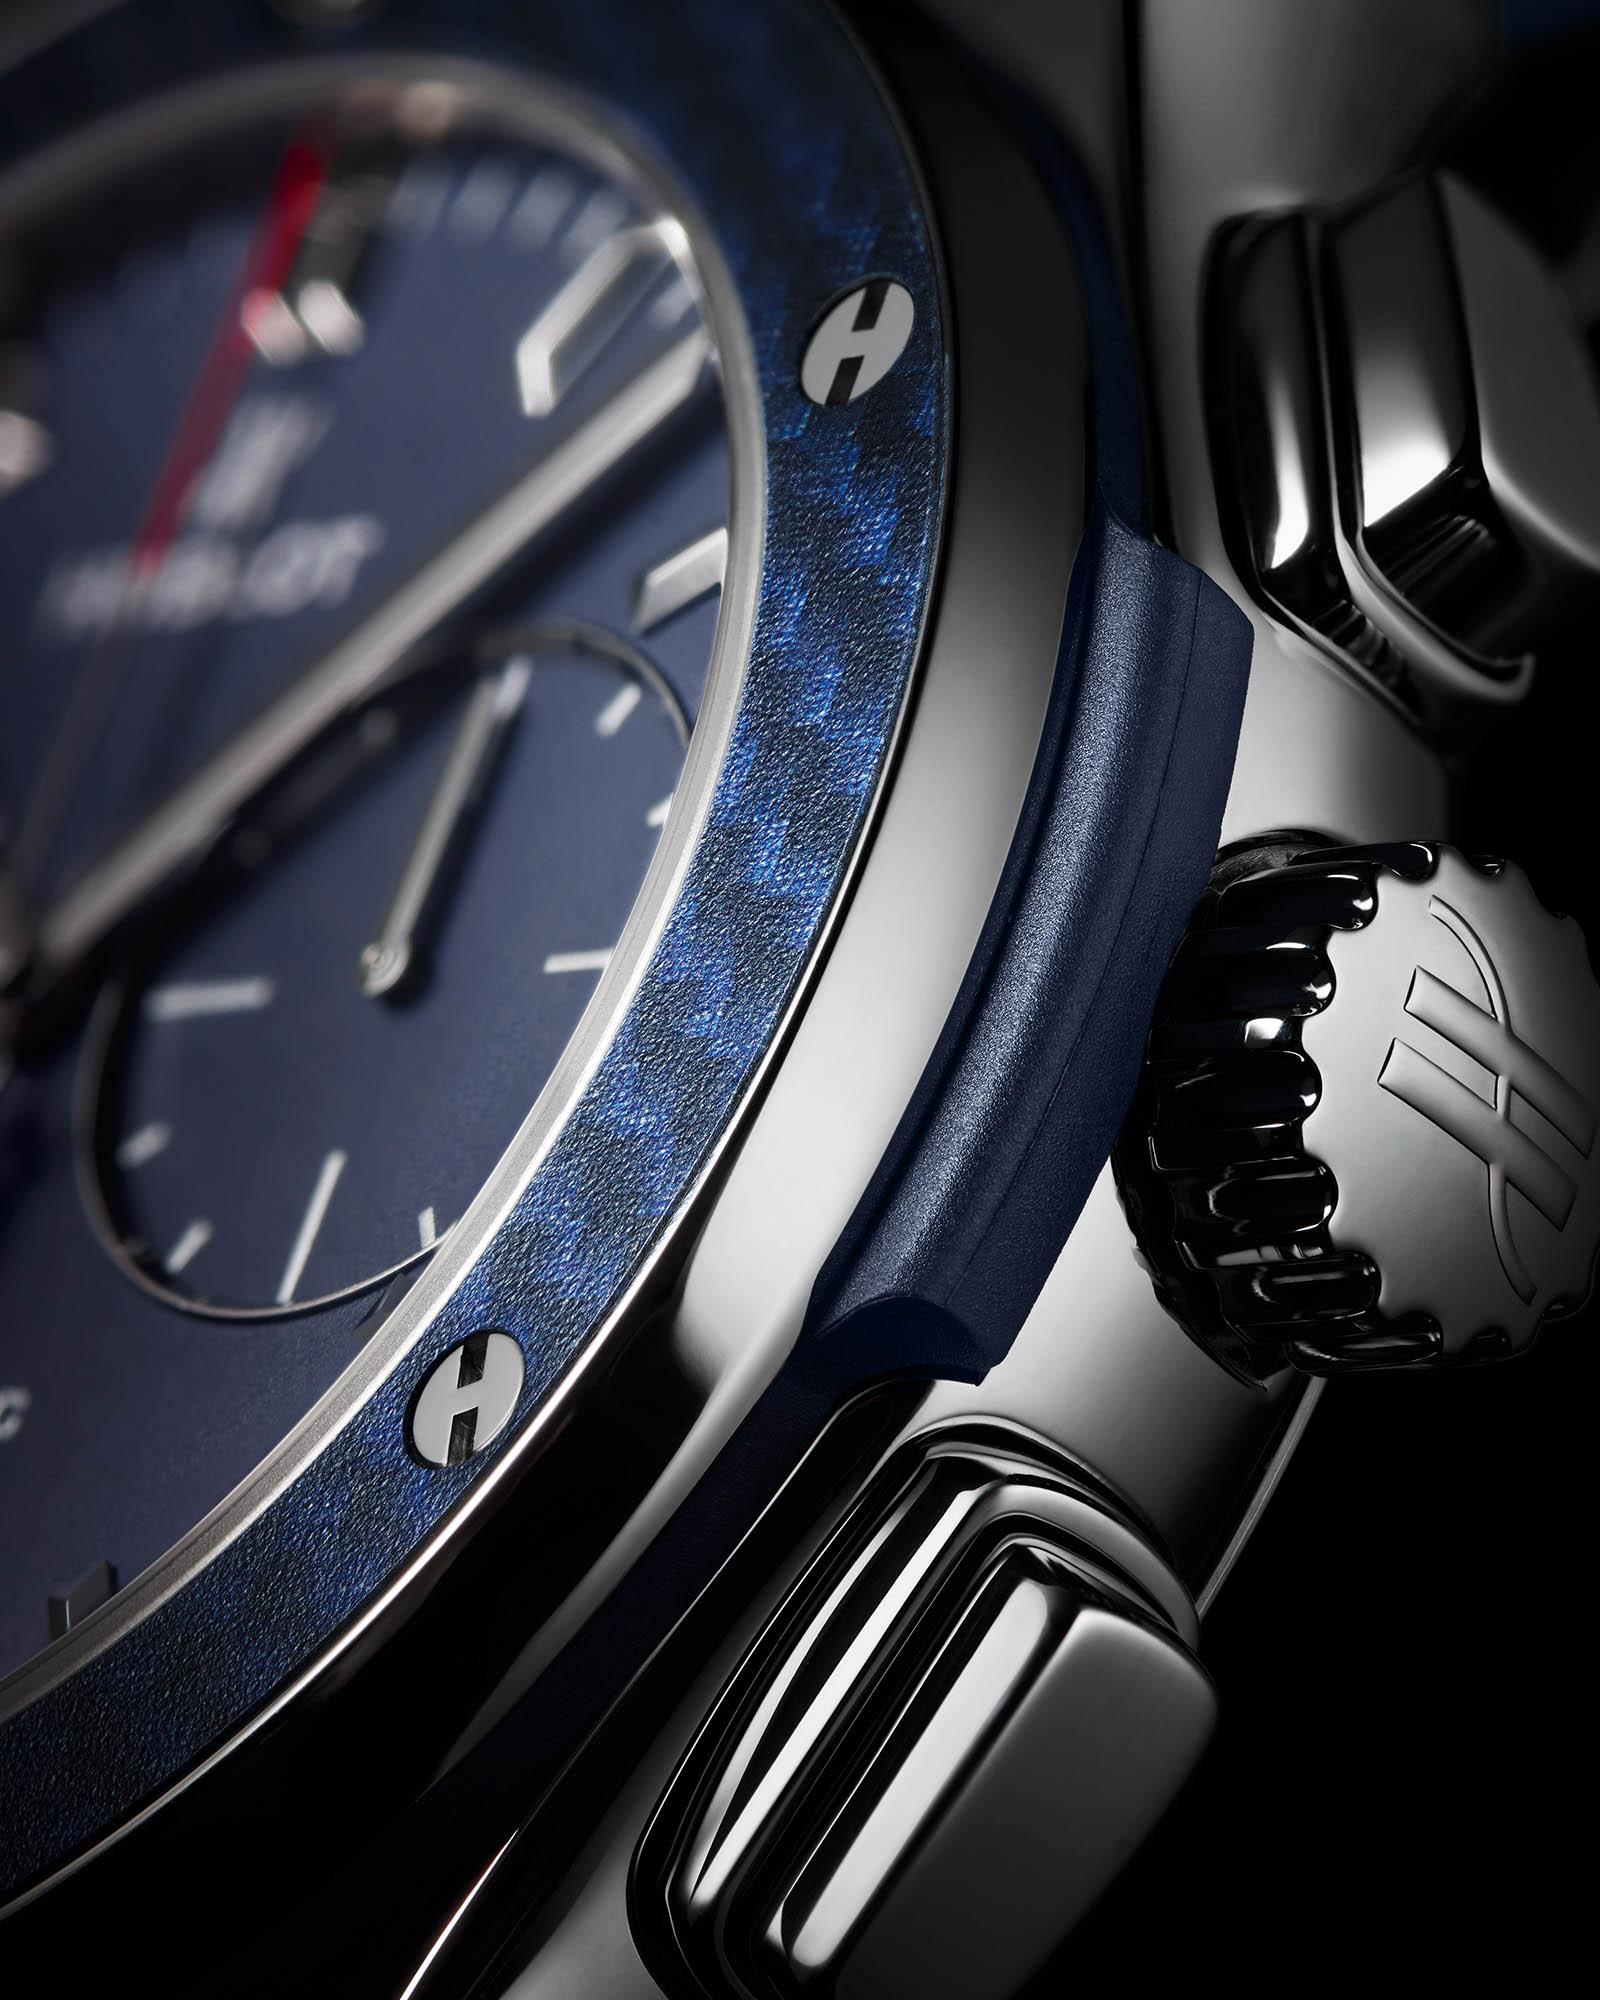 hublot-classic-fusion-chronograph-new-york-eli-manning-2.jpg